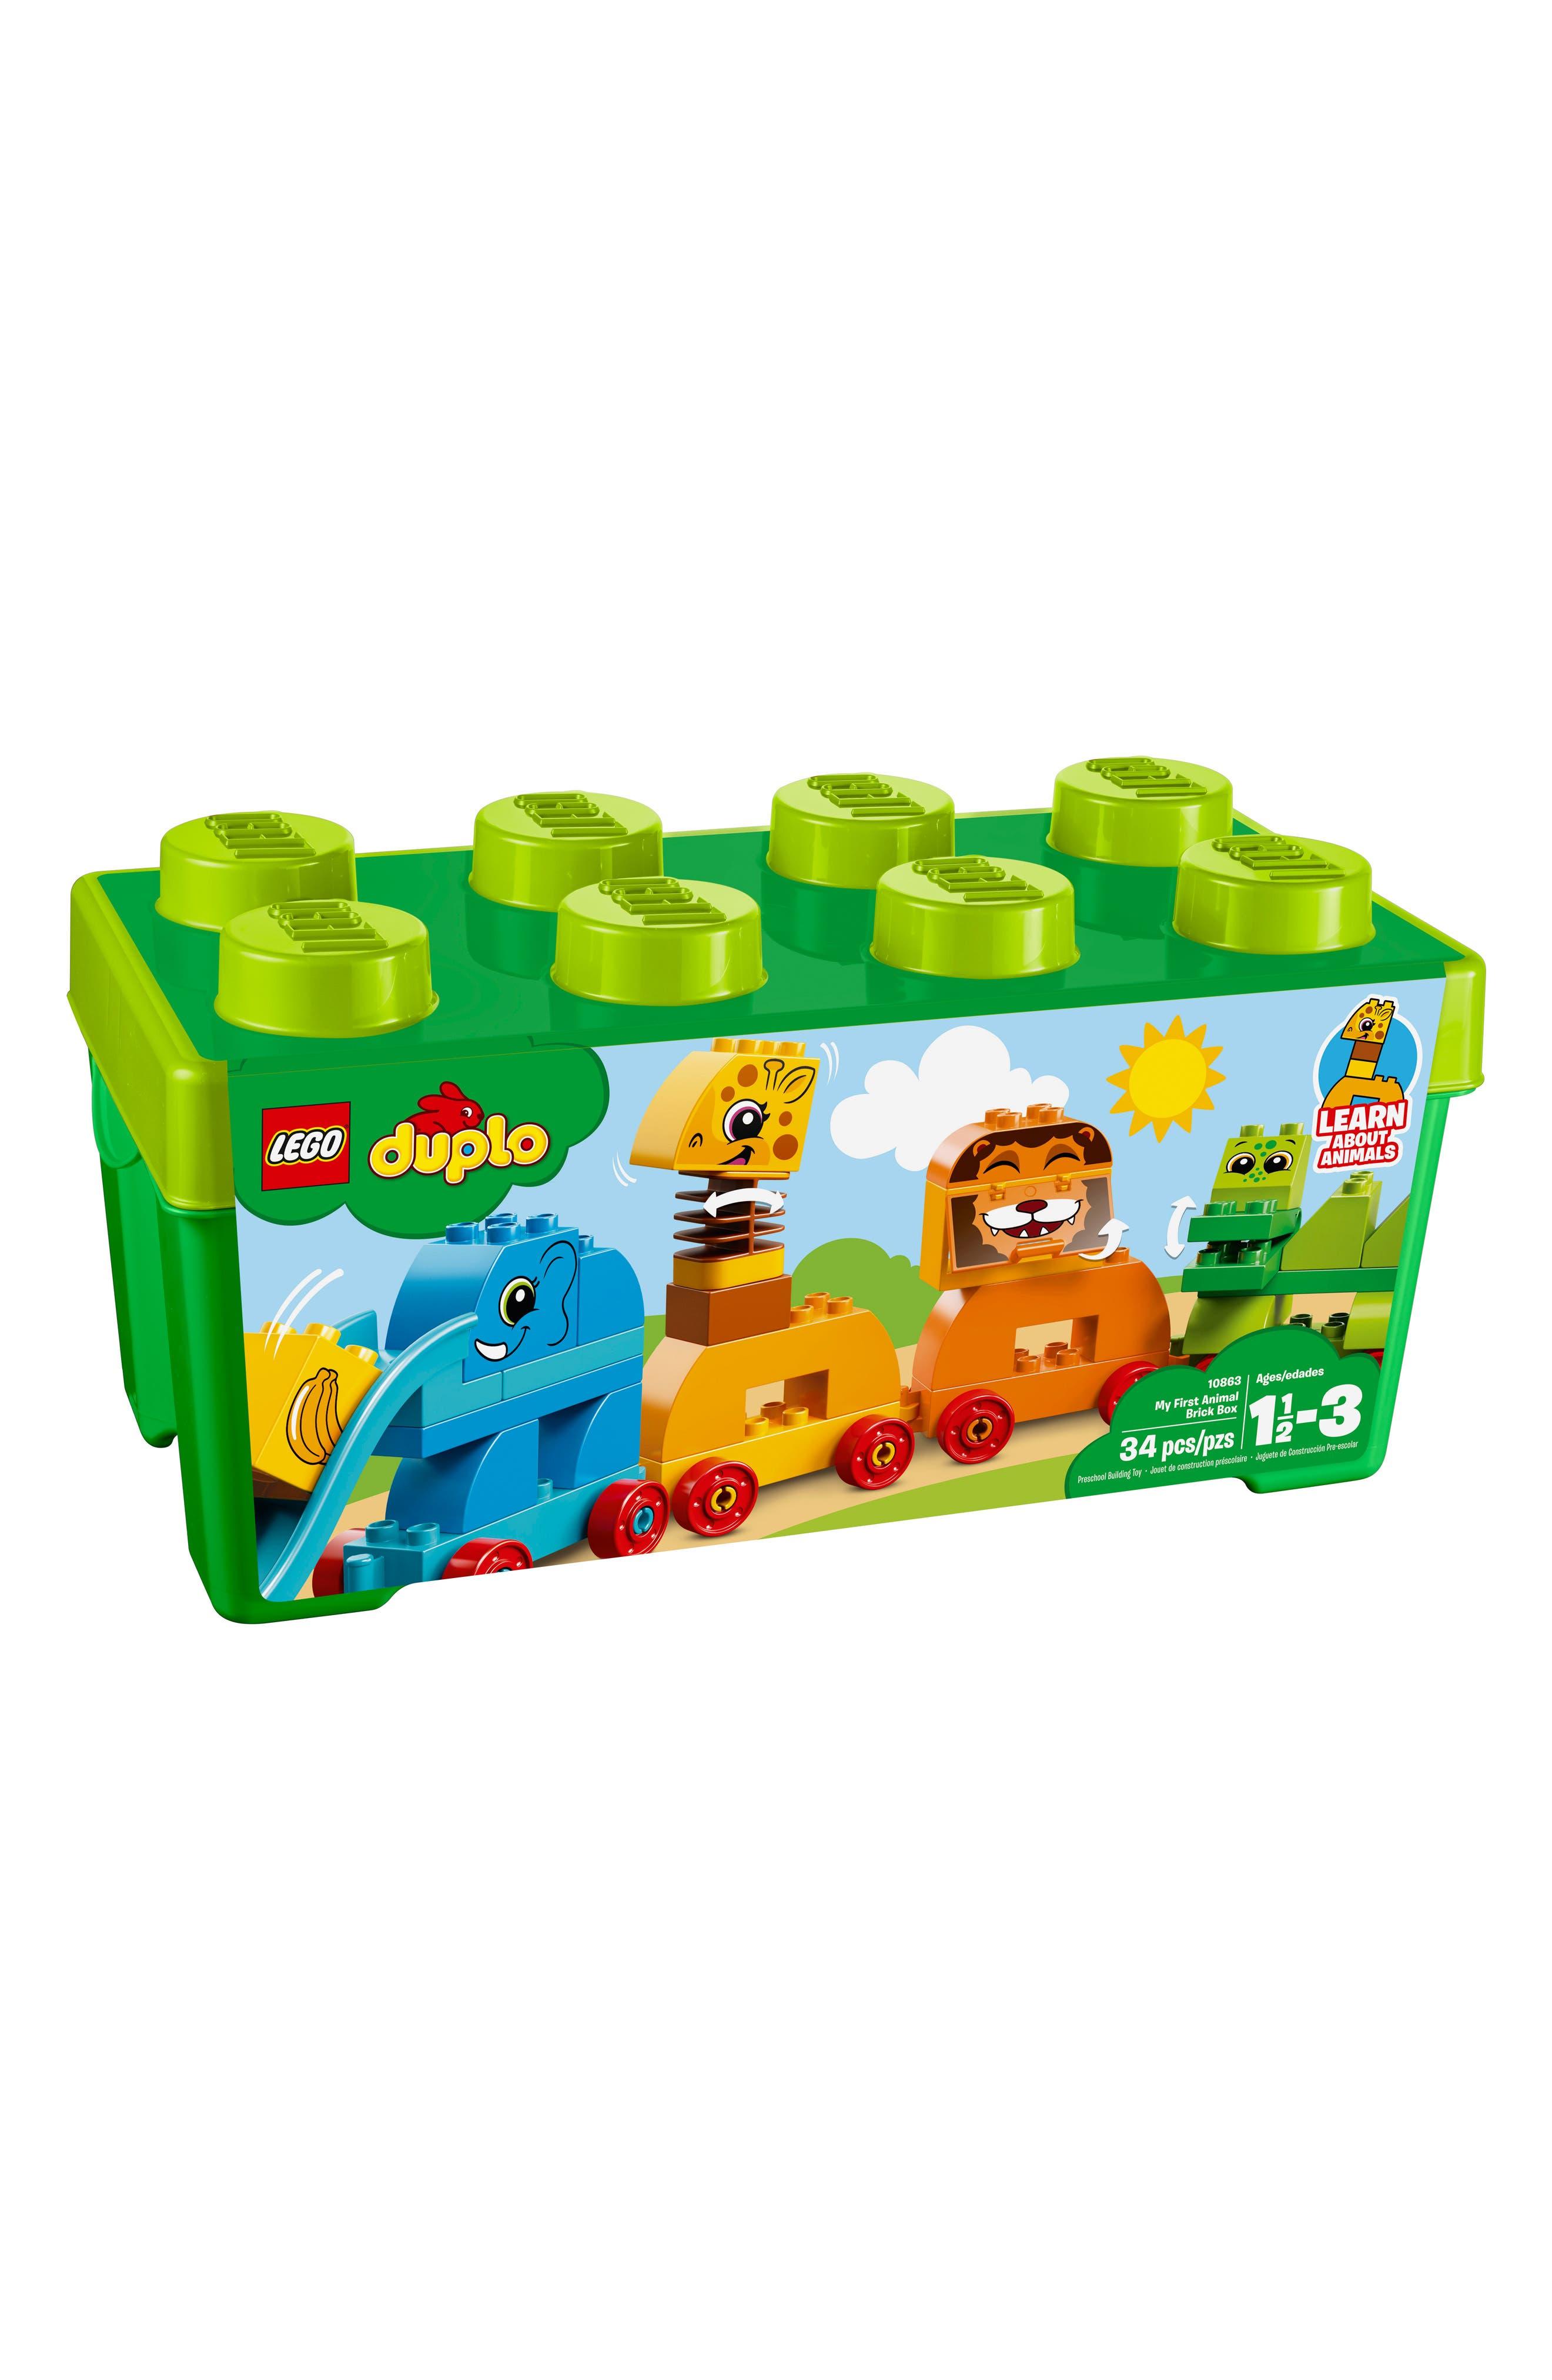 DUPLO<sup>®</sup> My First Animal Brick Box - 10863,                         Main,                         color, Multi